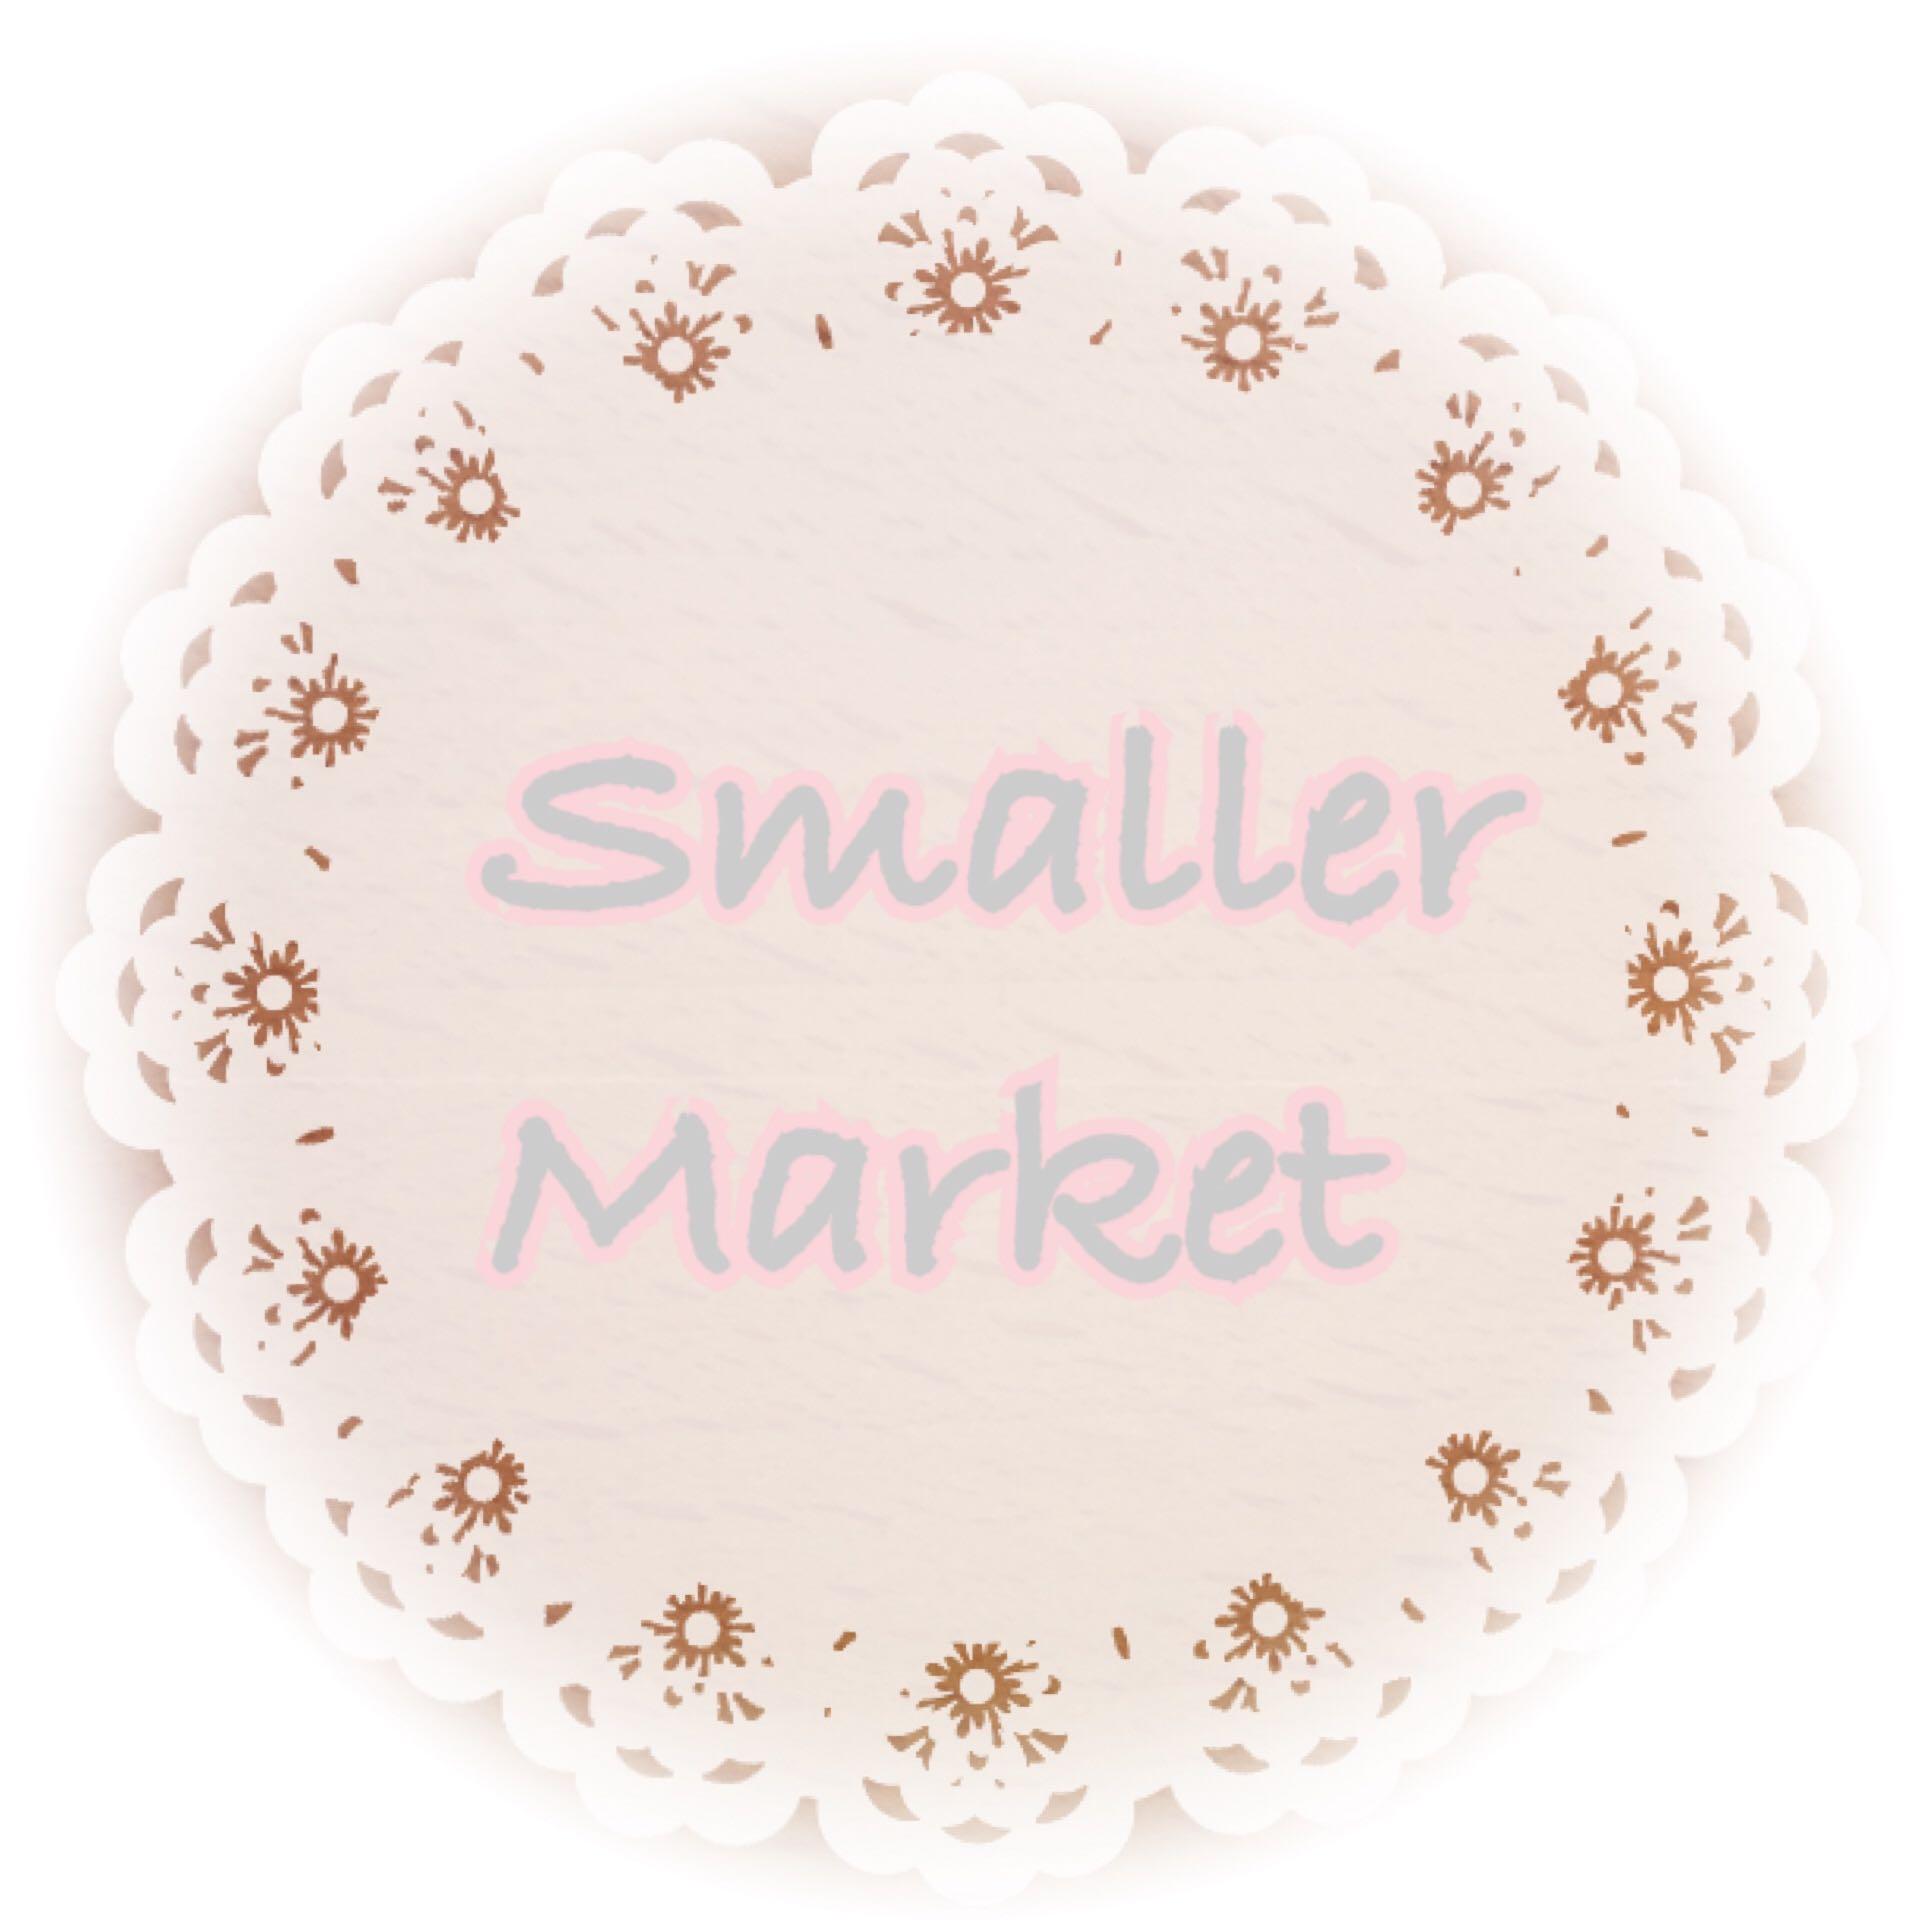 smallermarket